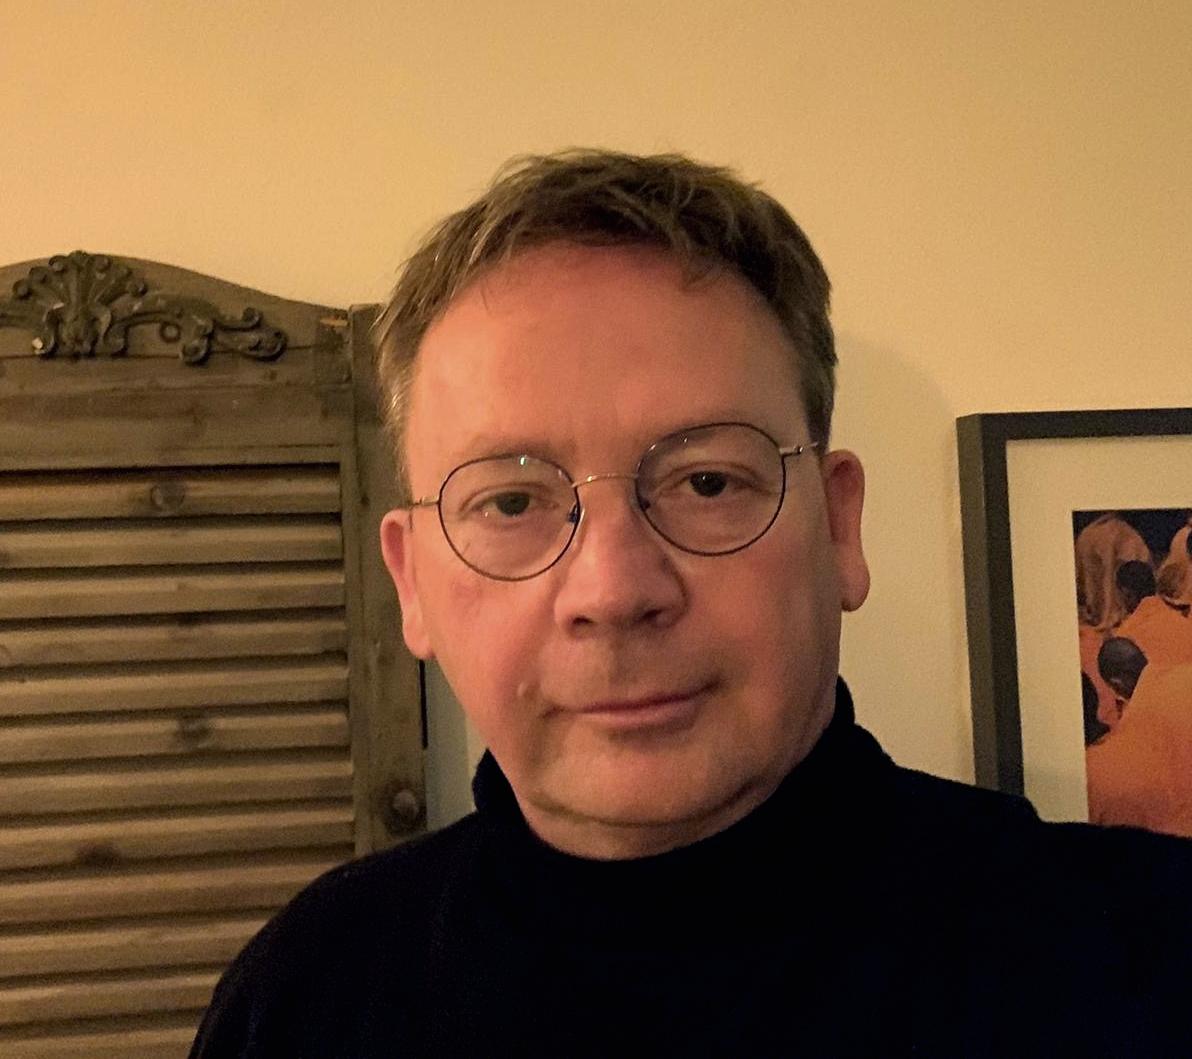 Bas van der Werf